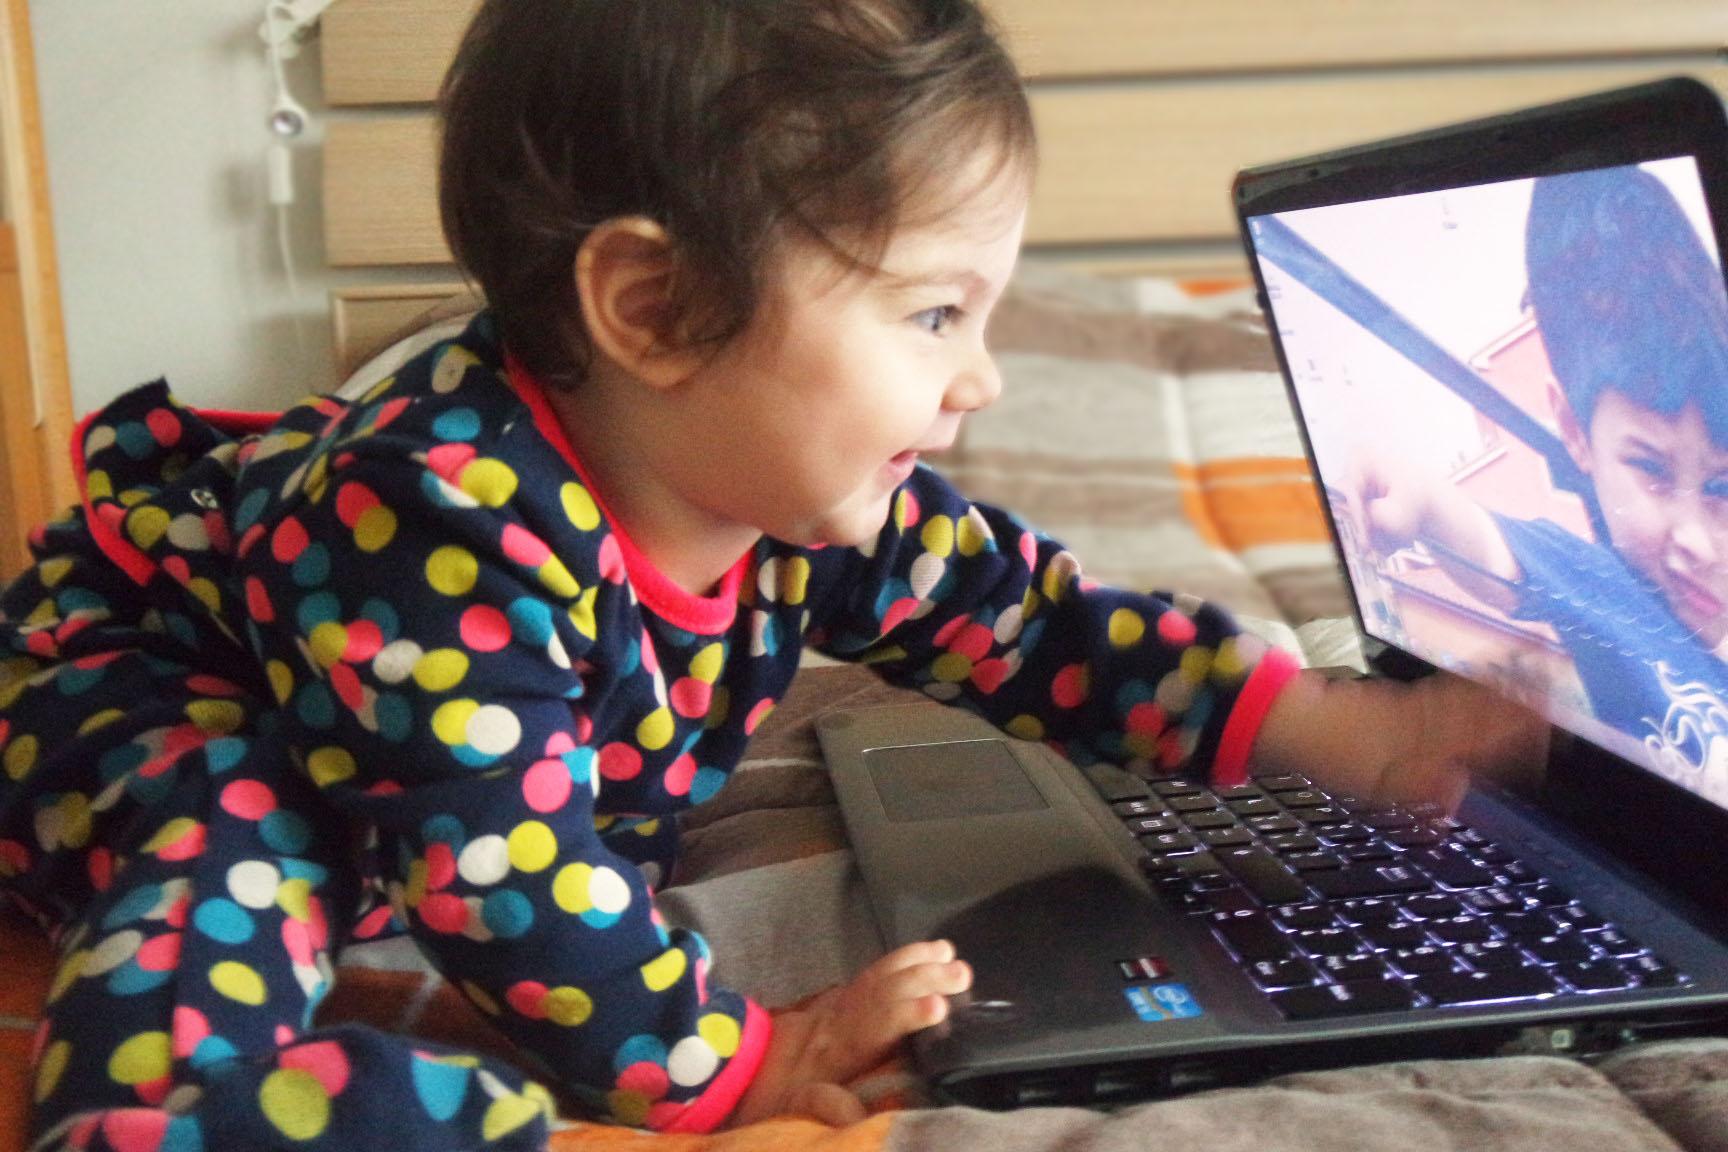 corso-di-blogging-gratis-per-iniziare-sabina-montevergine